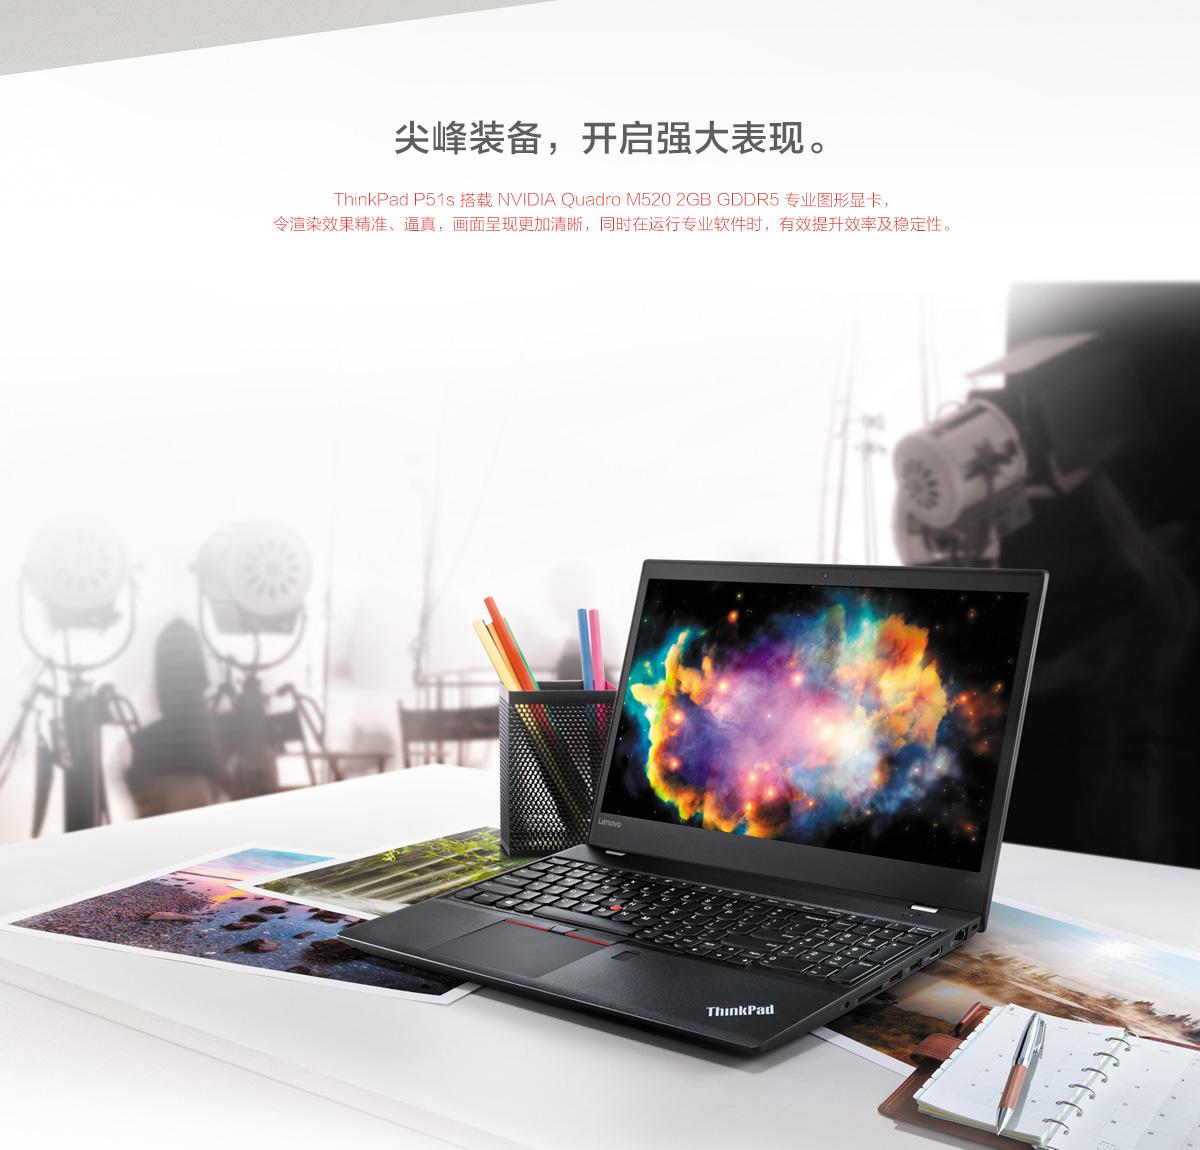 ThinkpadP51s(PC)2